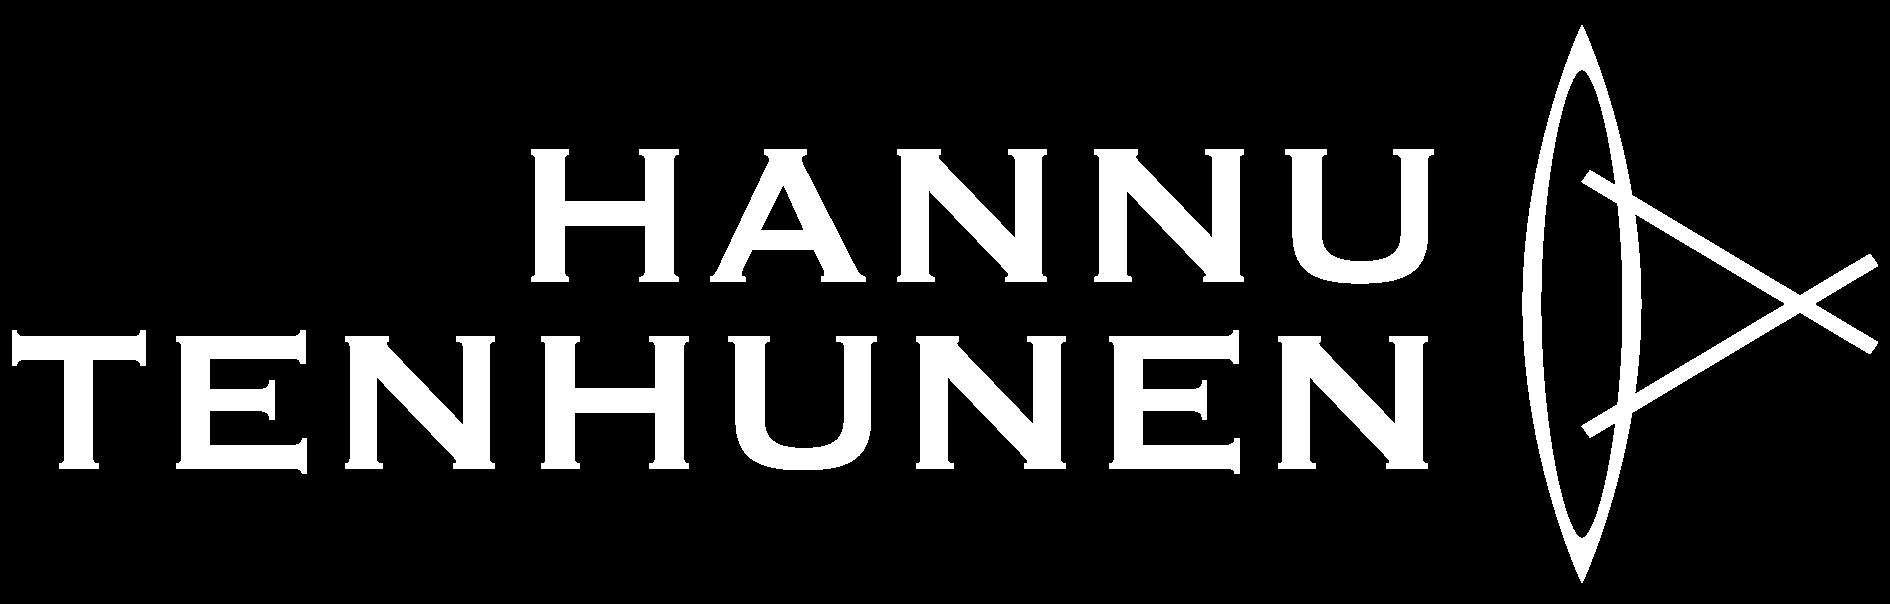 Hannu Tenhunen